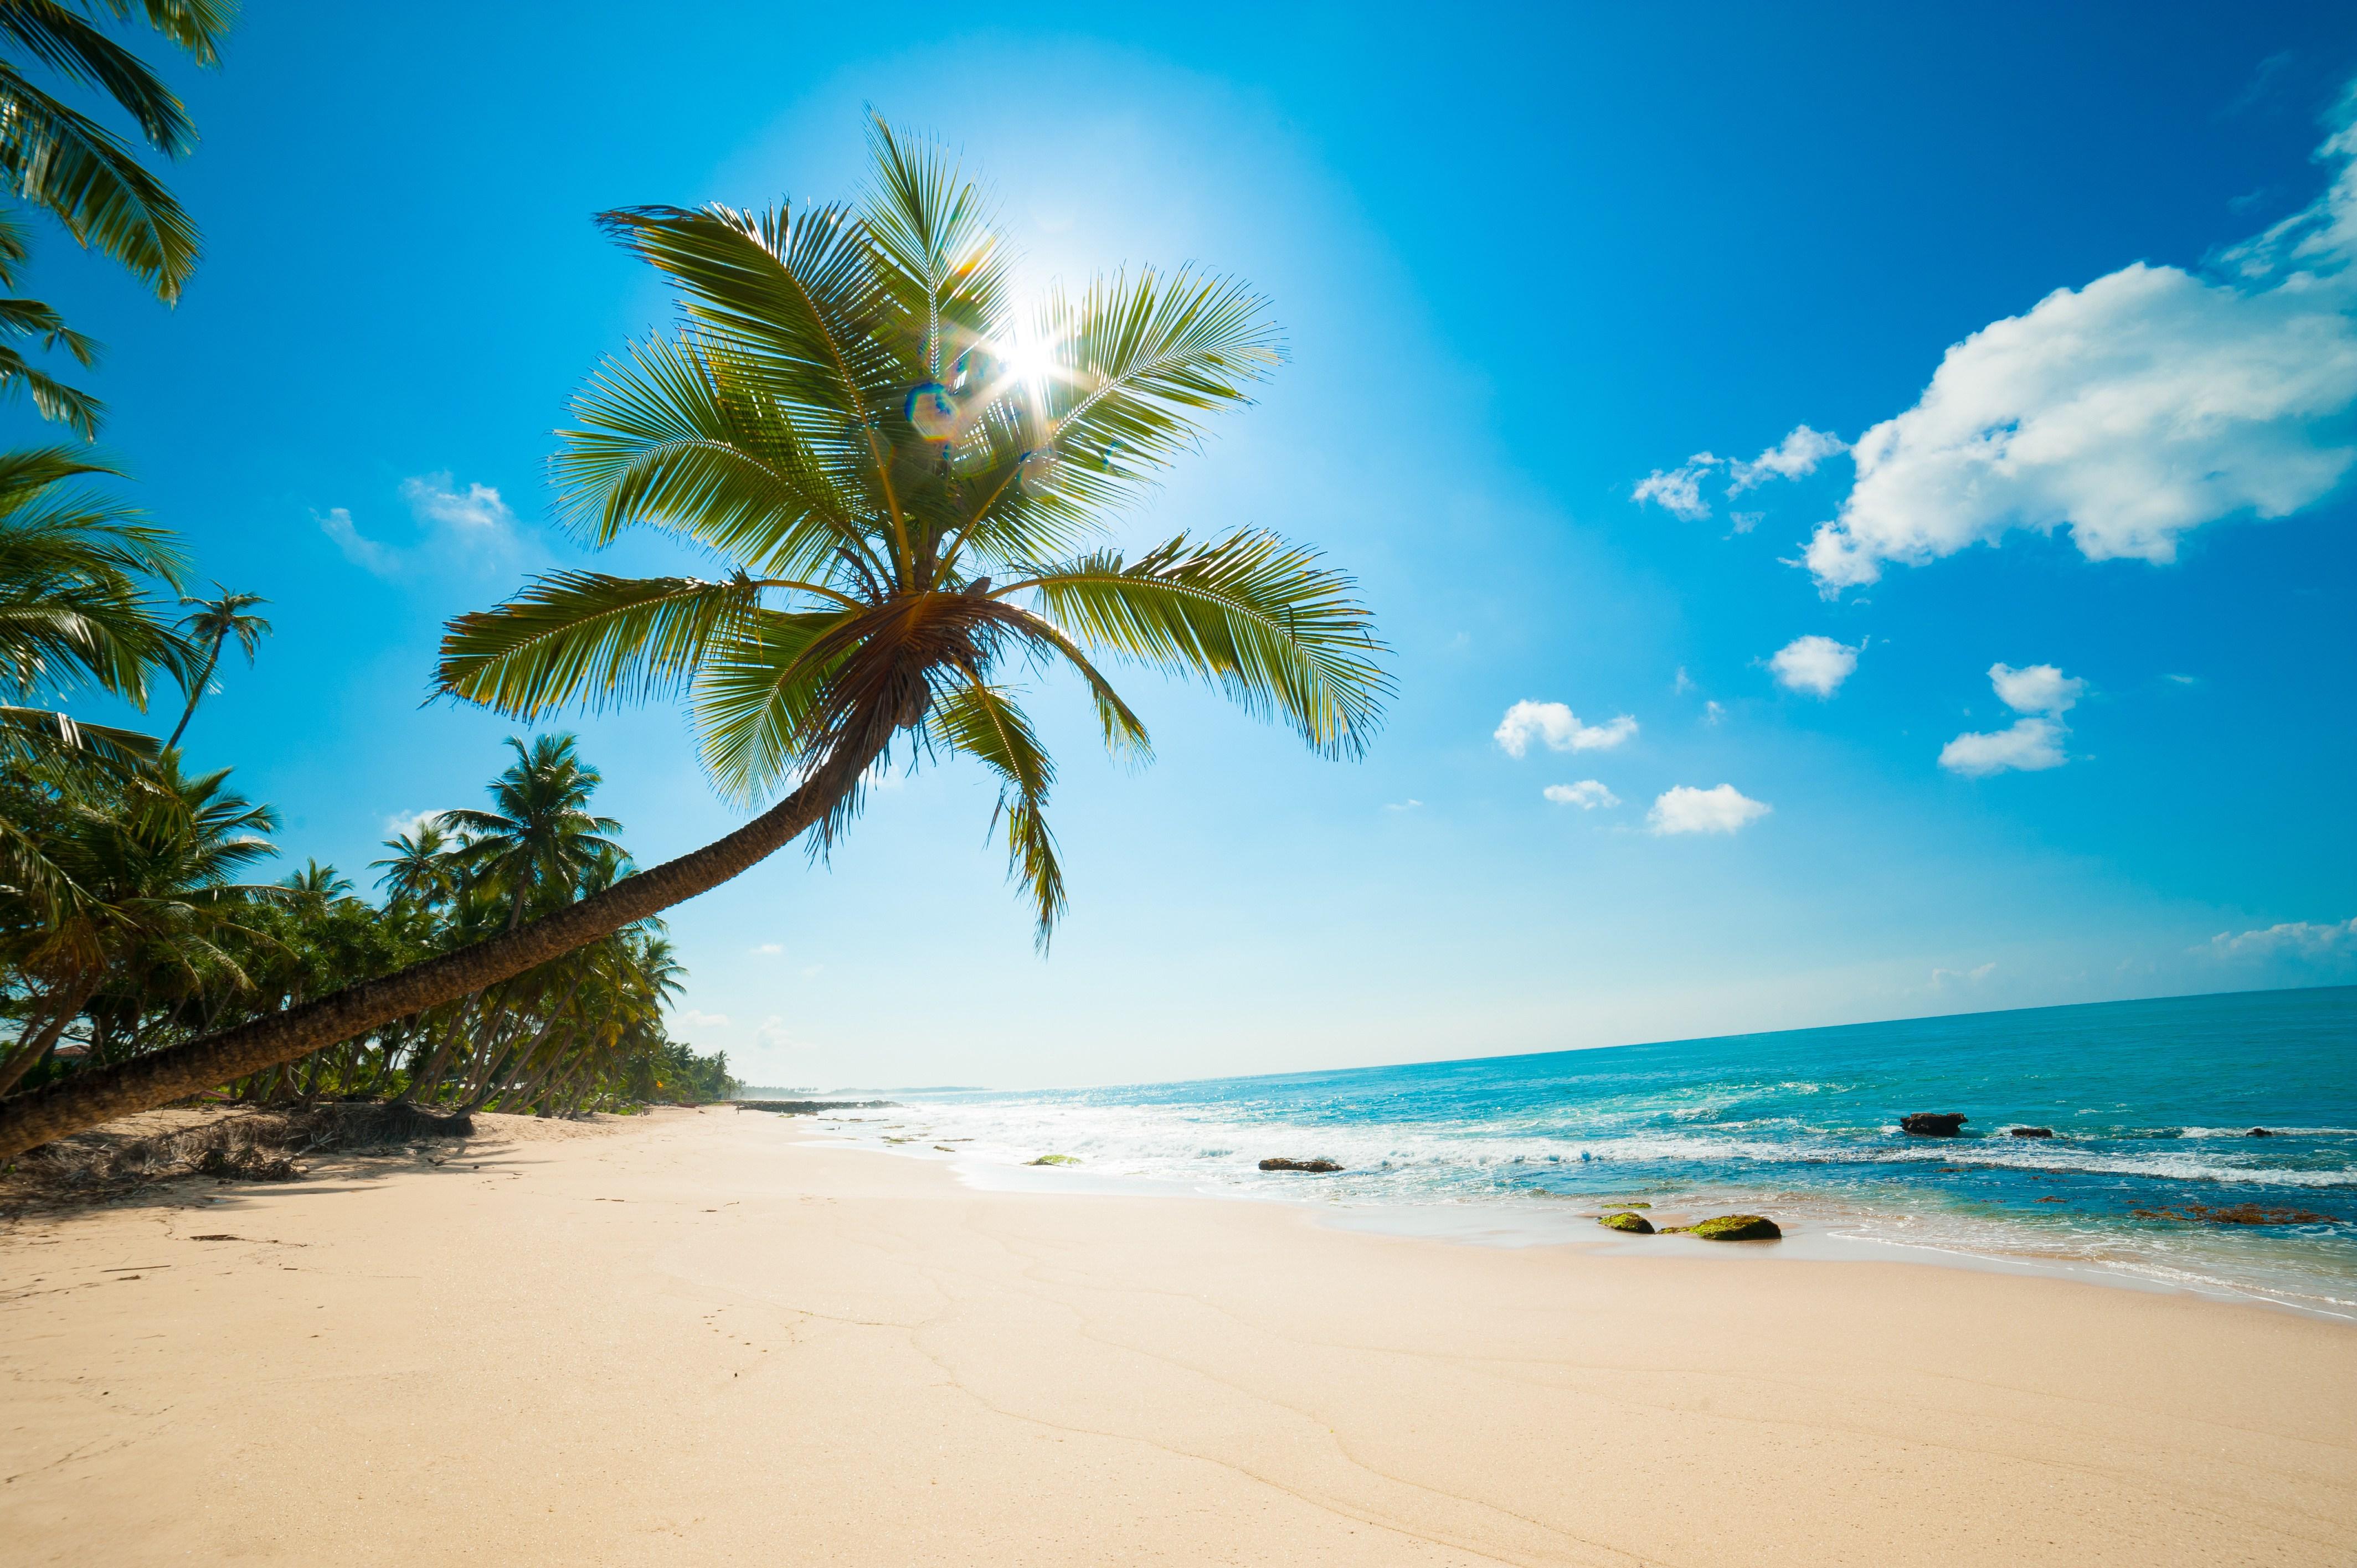 Tropical Beach - Sentient Life